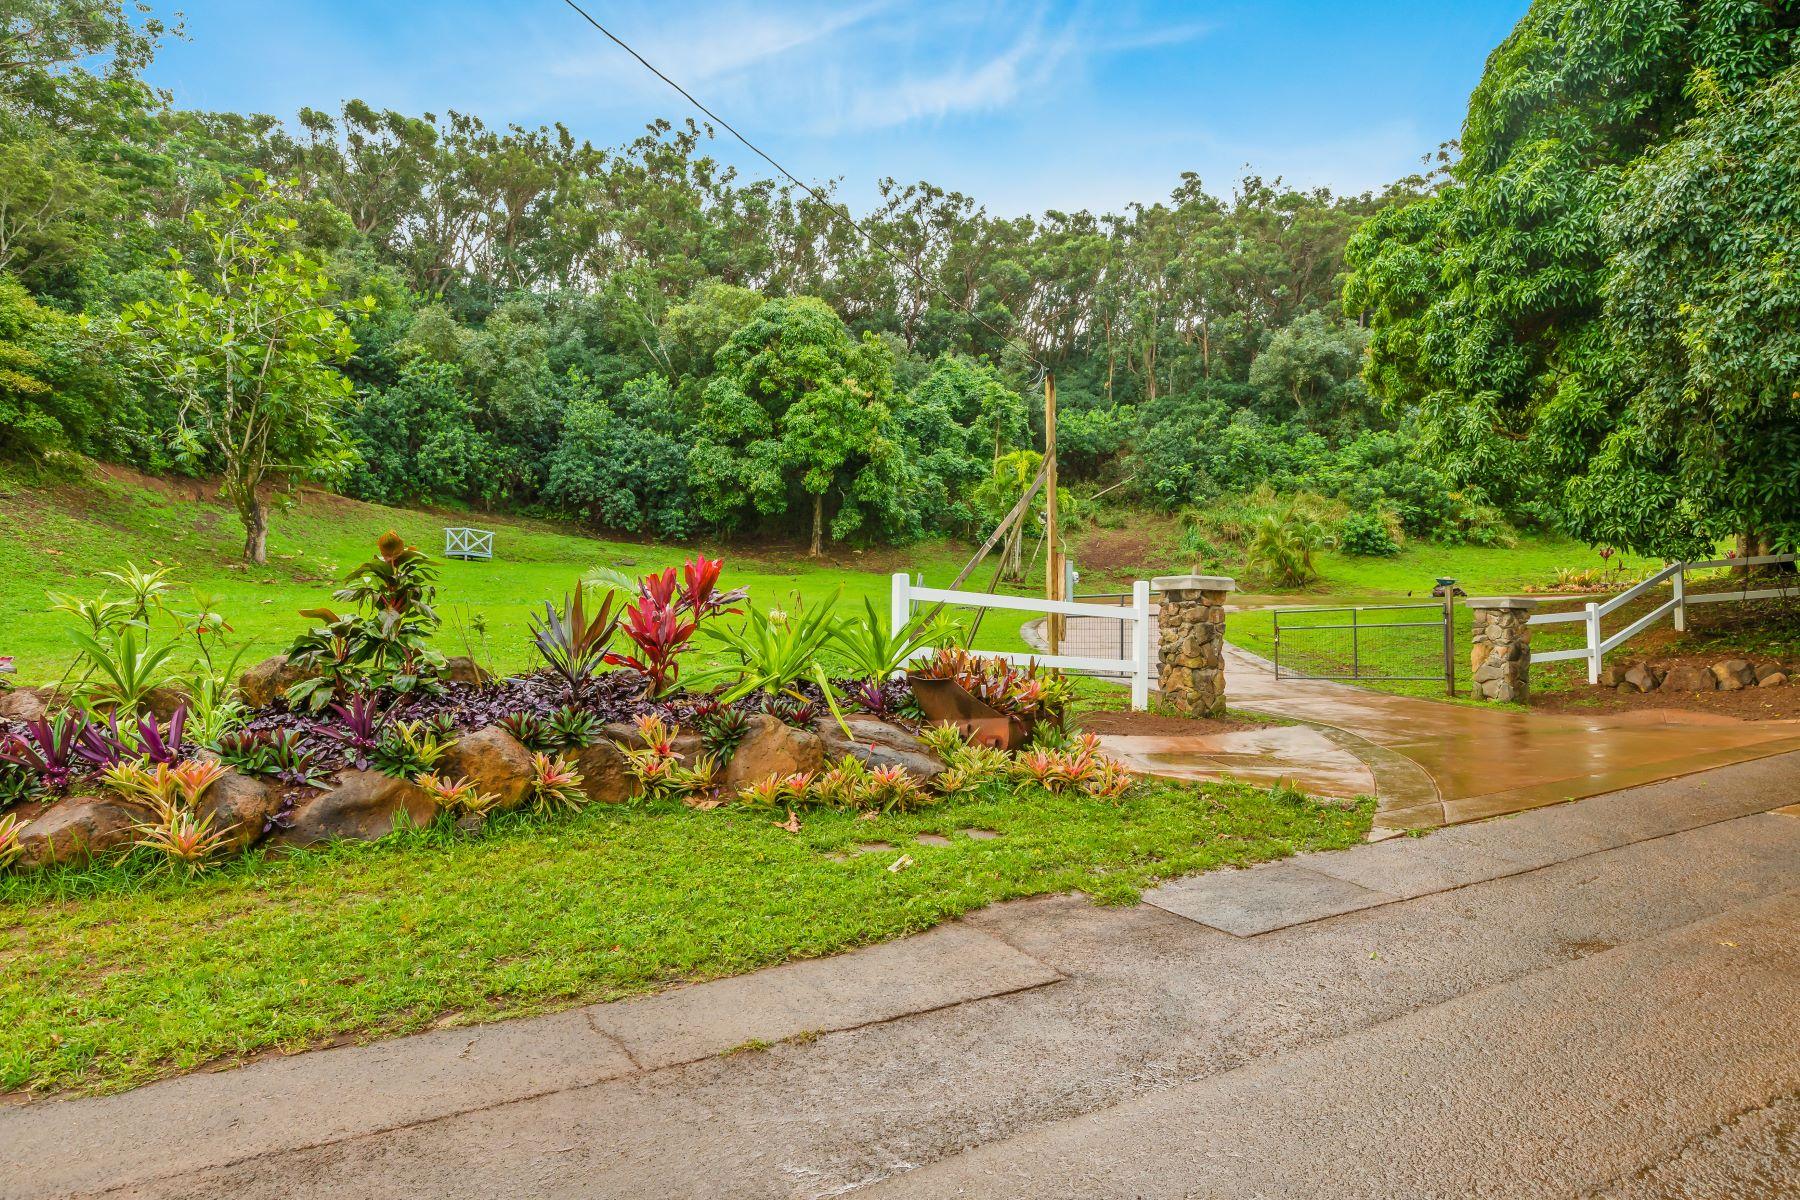 Land for Sale at UMIUMI RD KALAHEO, HI 96741 UMIUMI RD Kalaheo, Hawaii 96741 United States